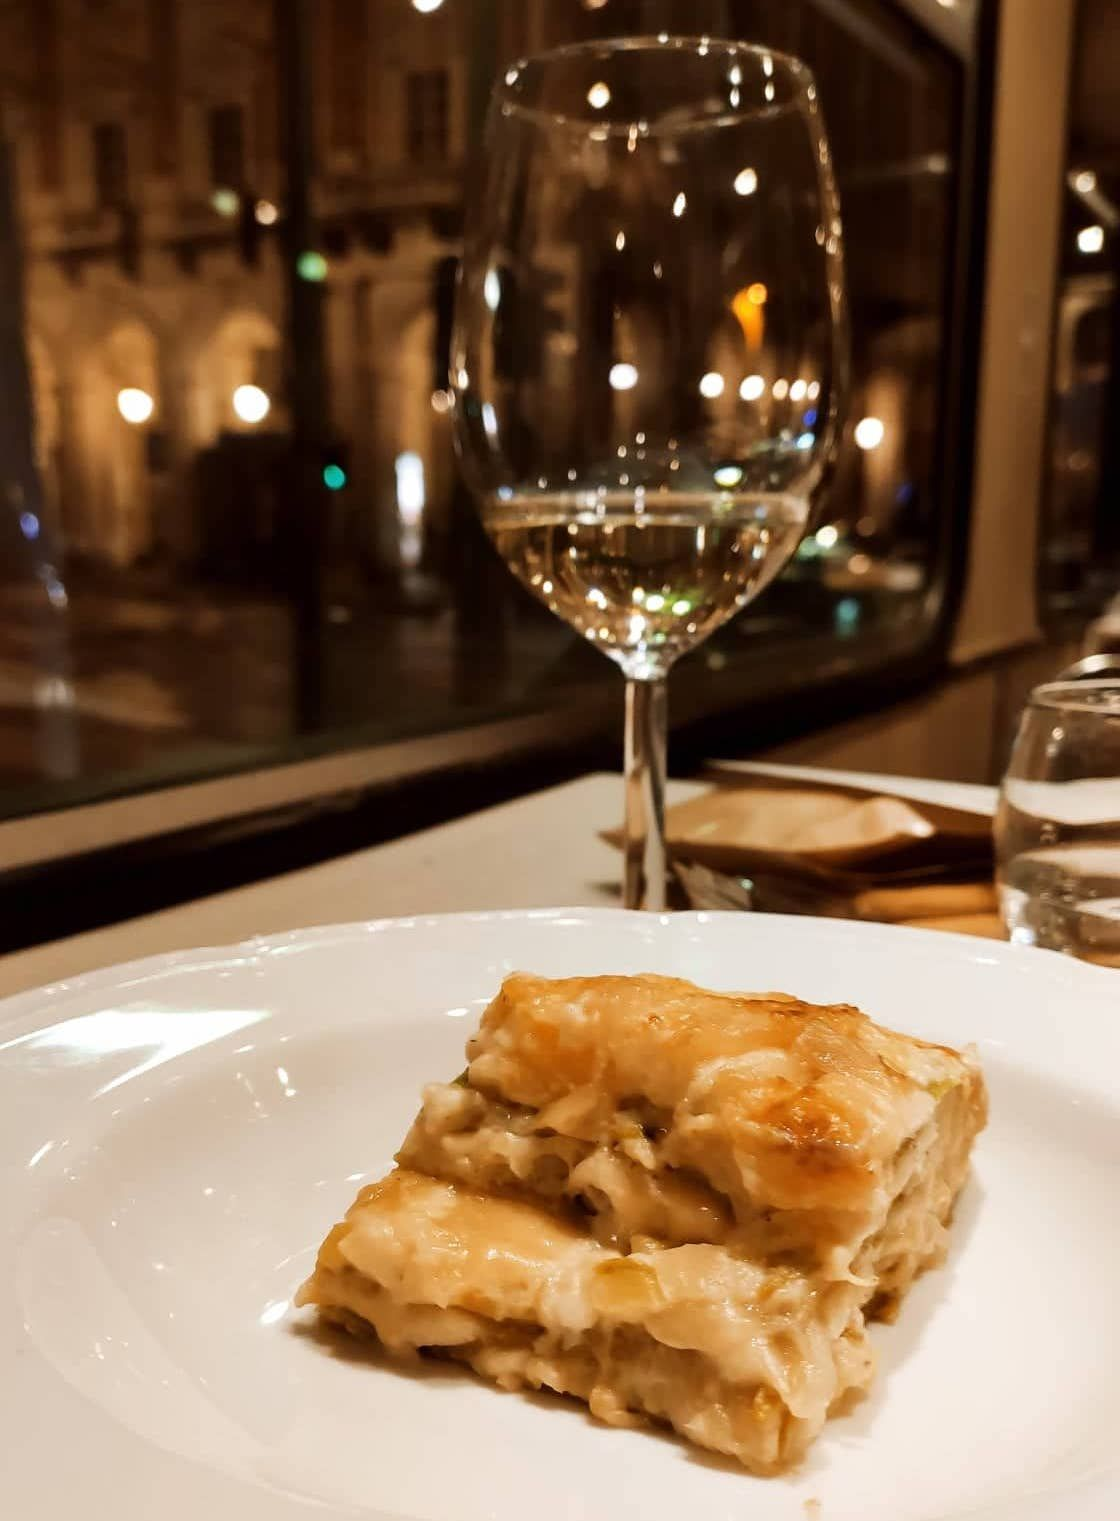 Expérience à Turin : dîner à bord d'un tram